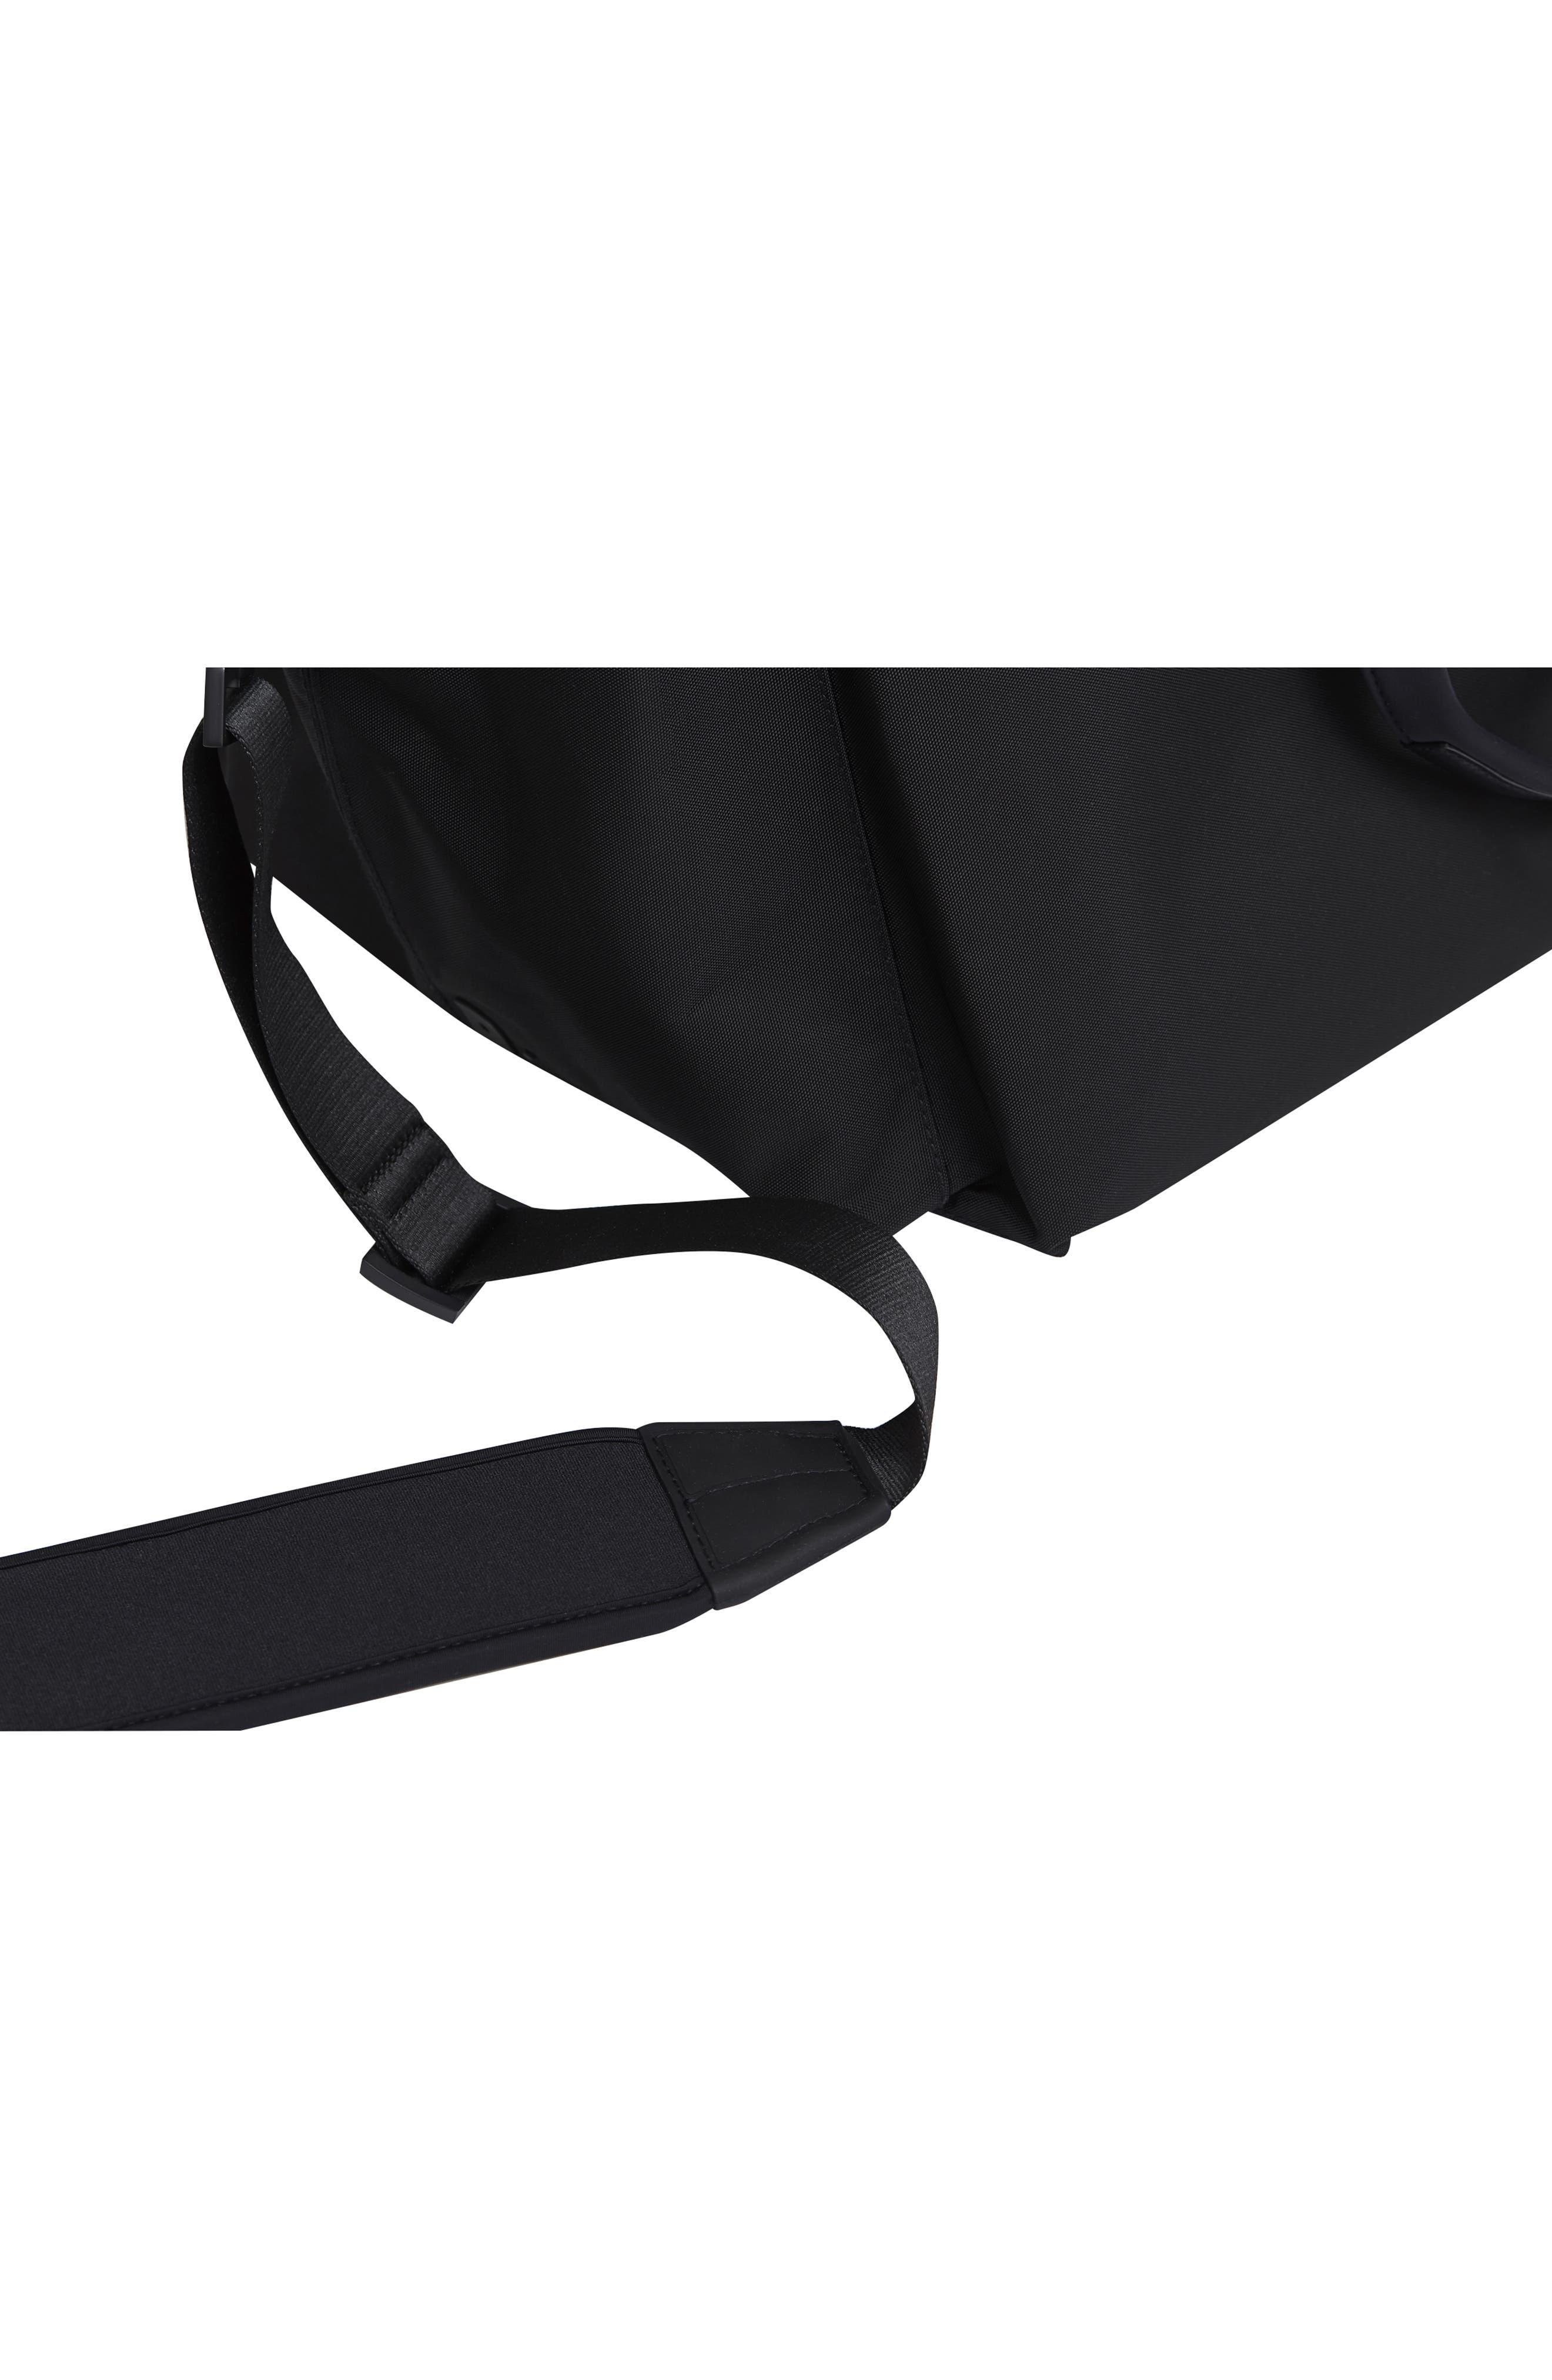 Lightweight Duffel Bag,                             Alternate thumbnail 9, color,                             Black Nylon/ Black Leather